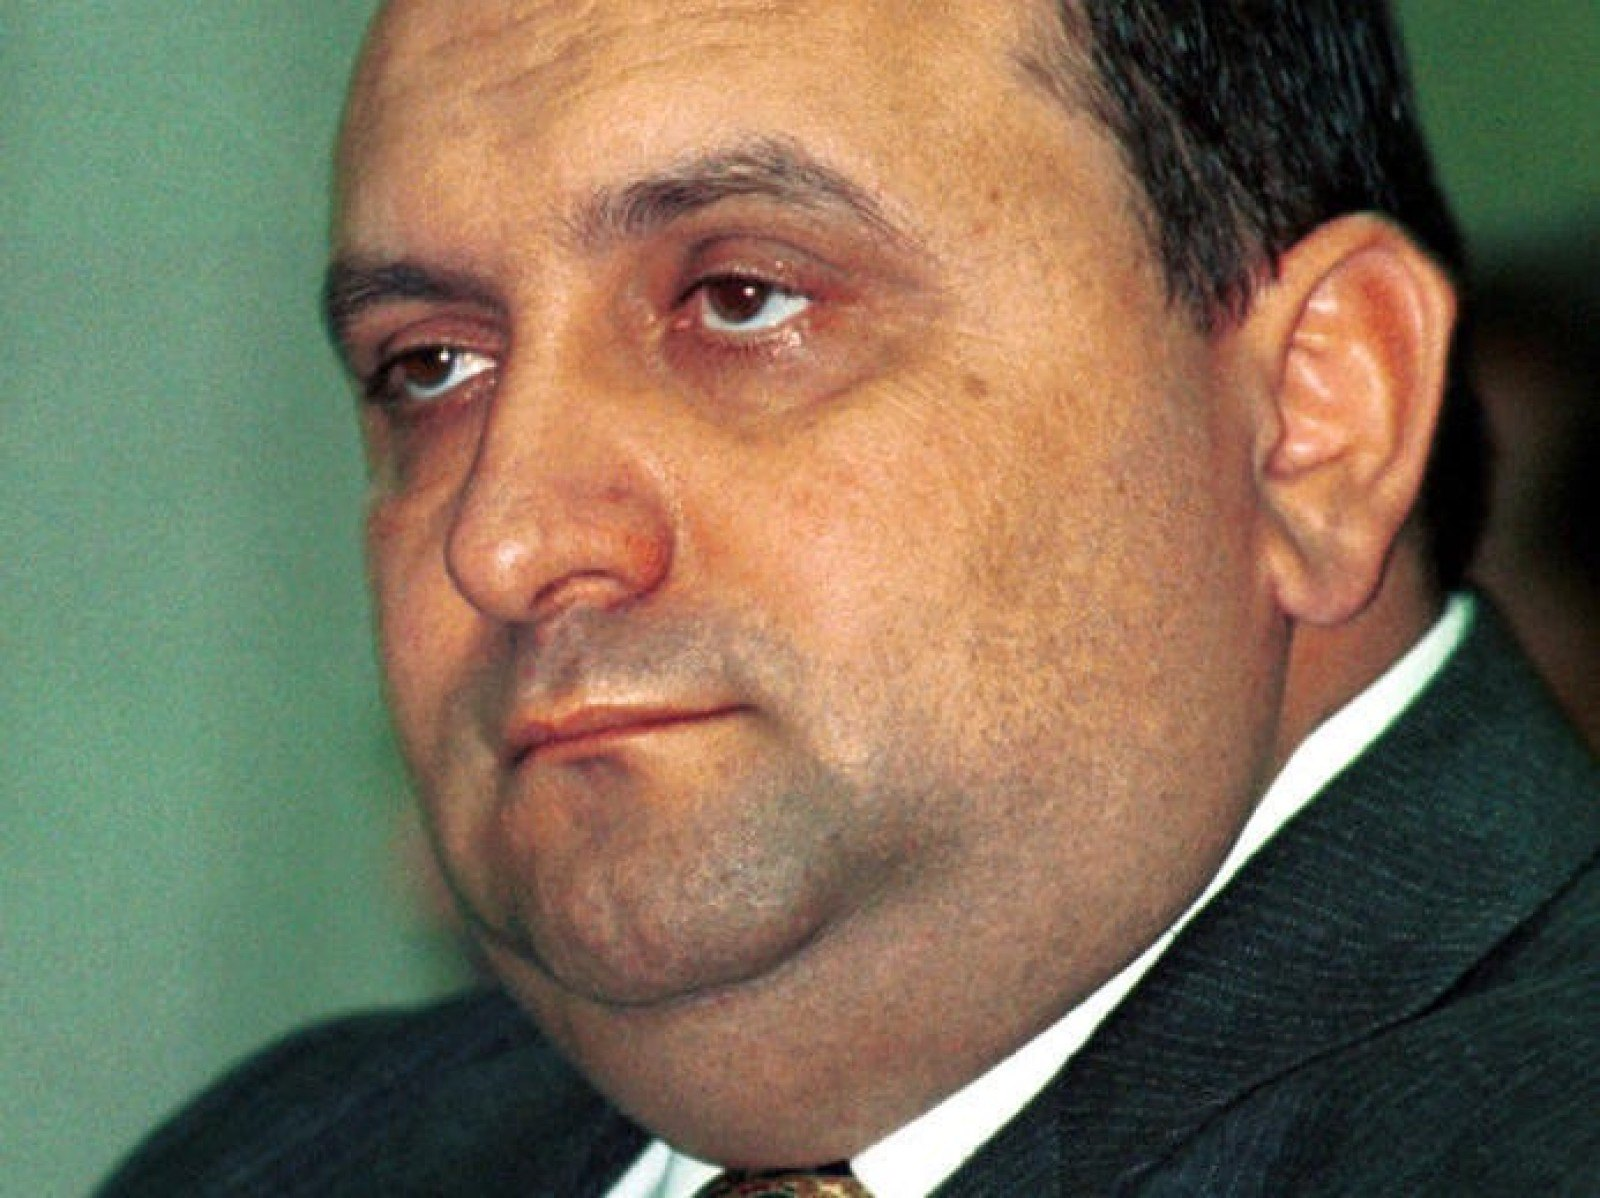 Dumitru Iliescu